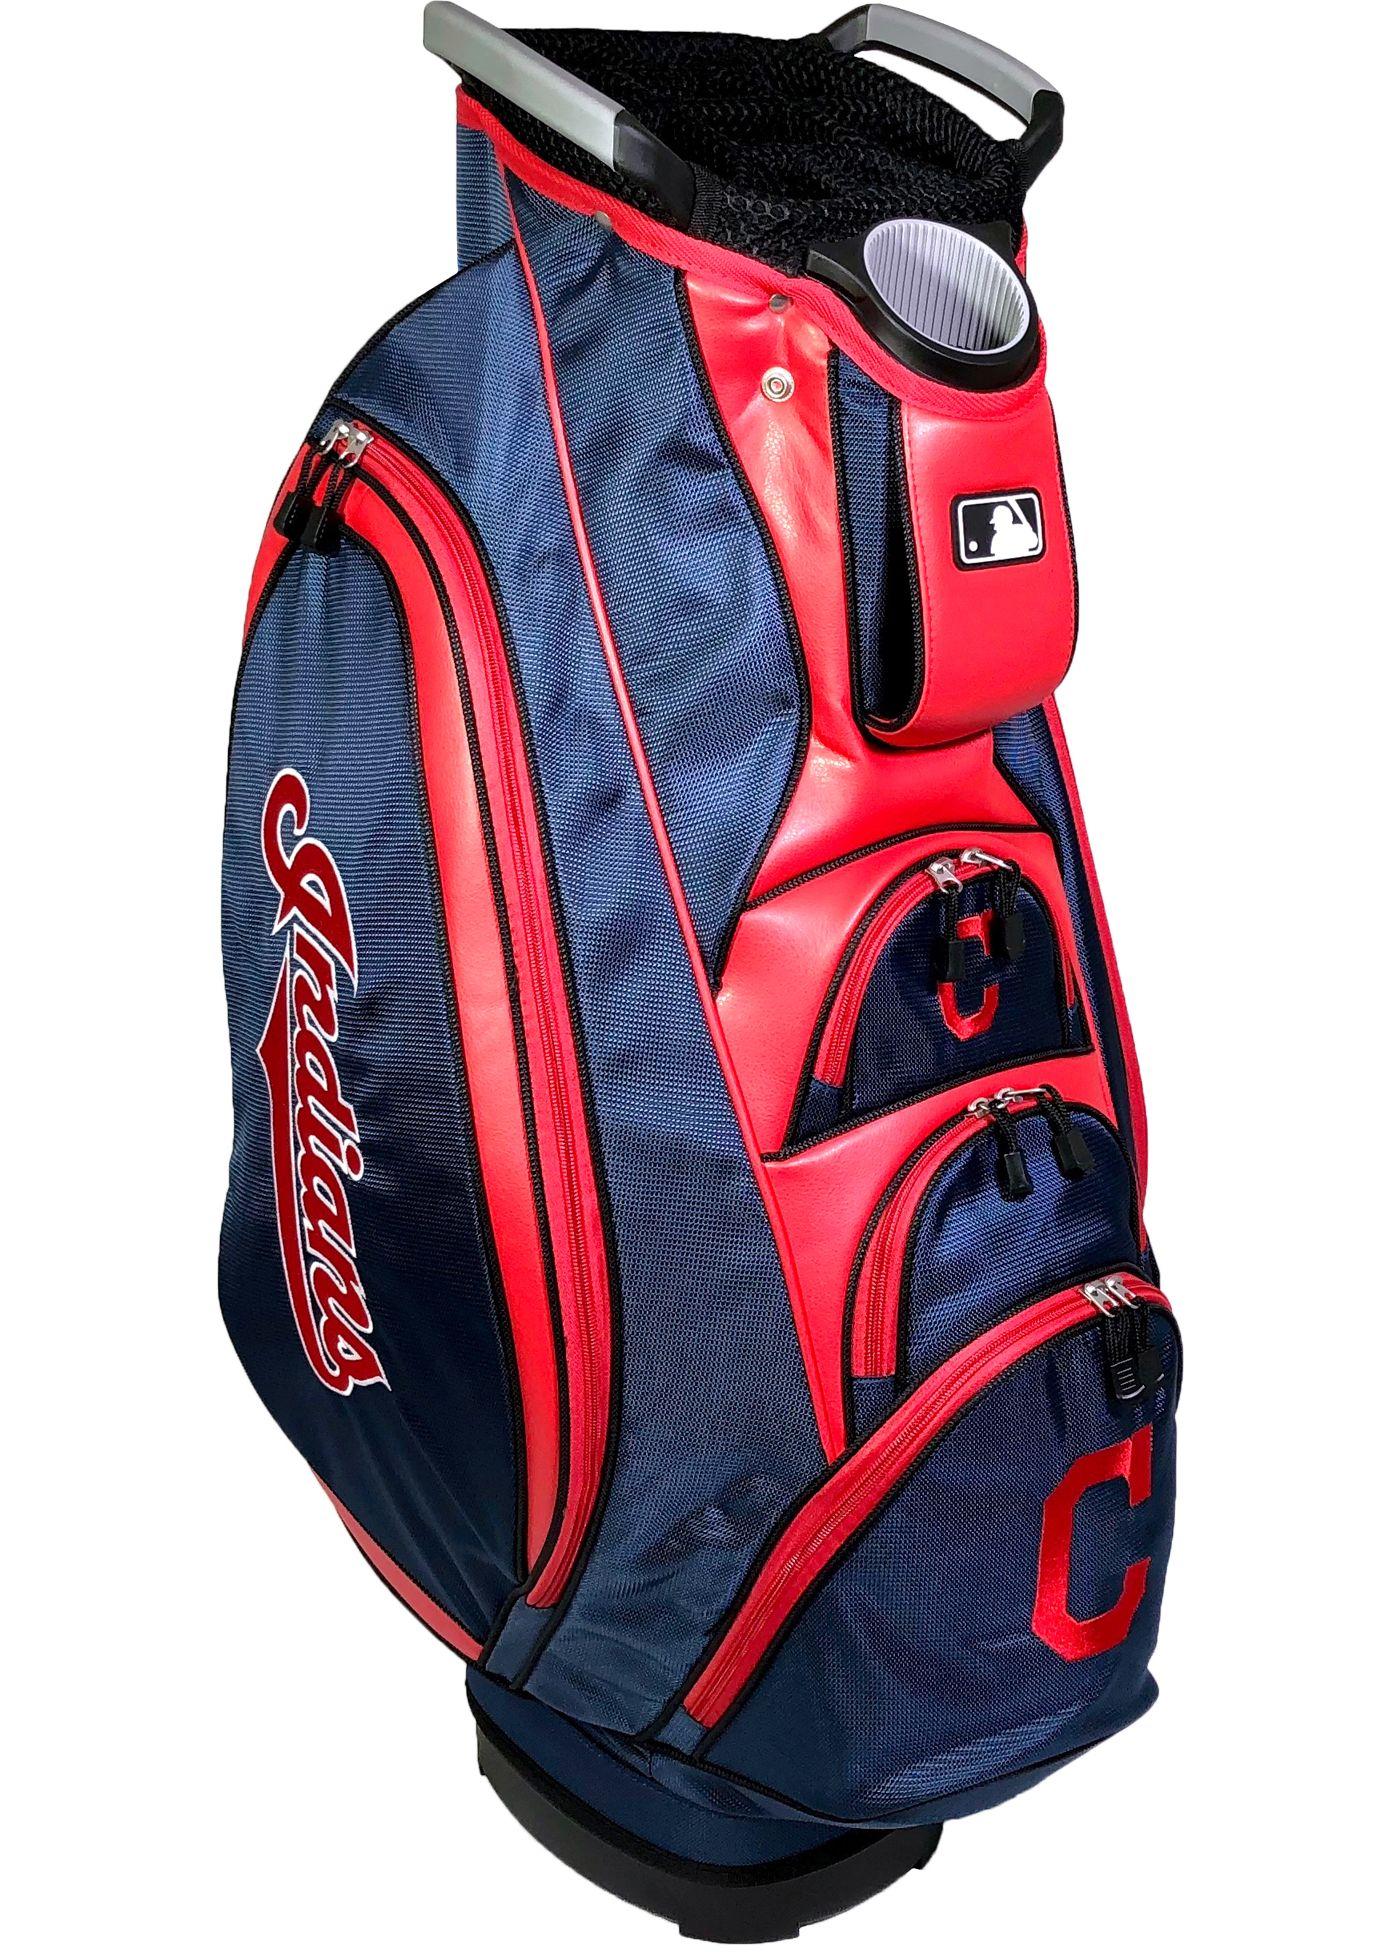 Team Golf Victory Cleveland Indians Cart Bag